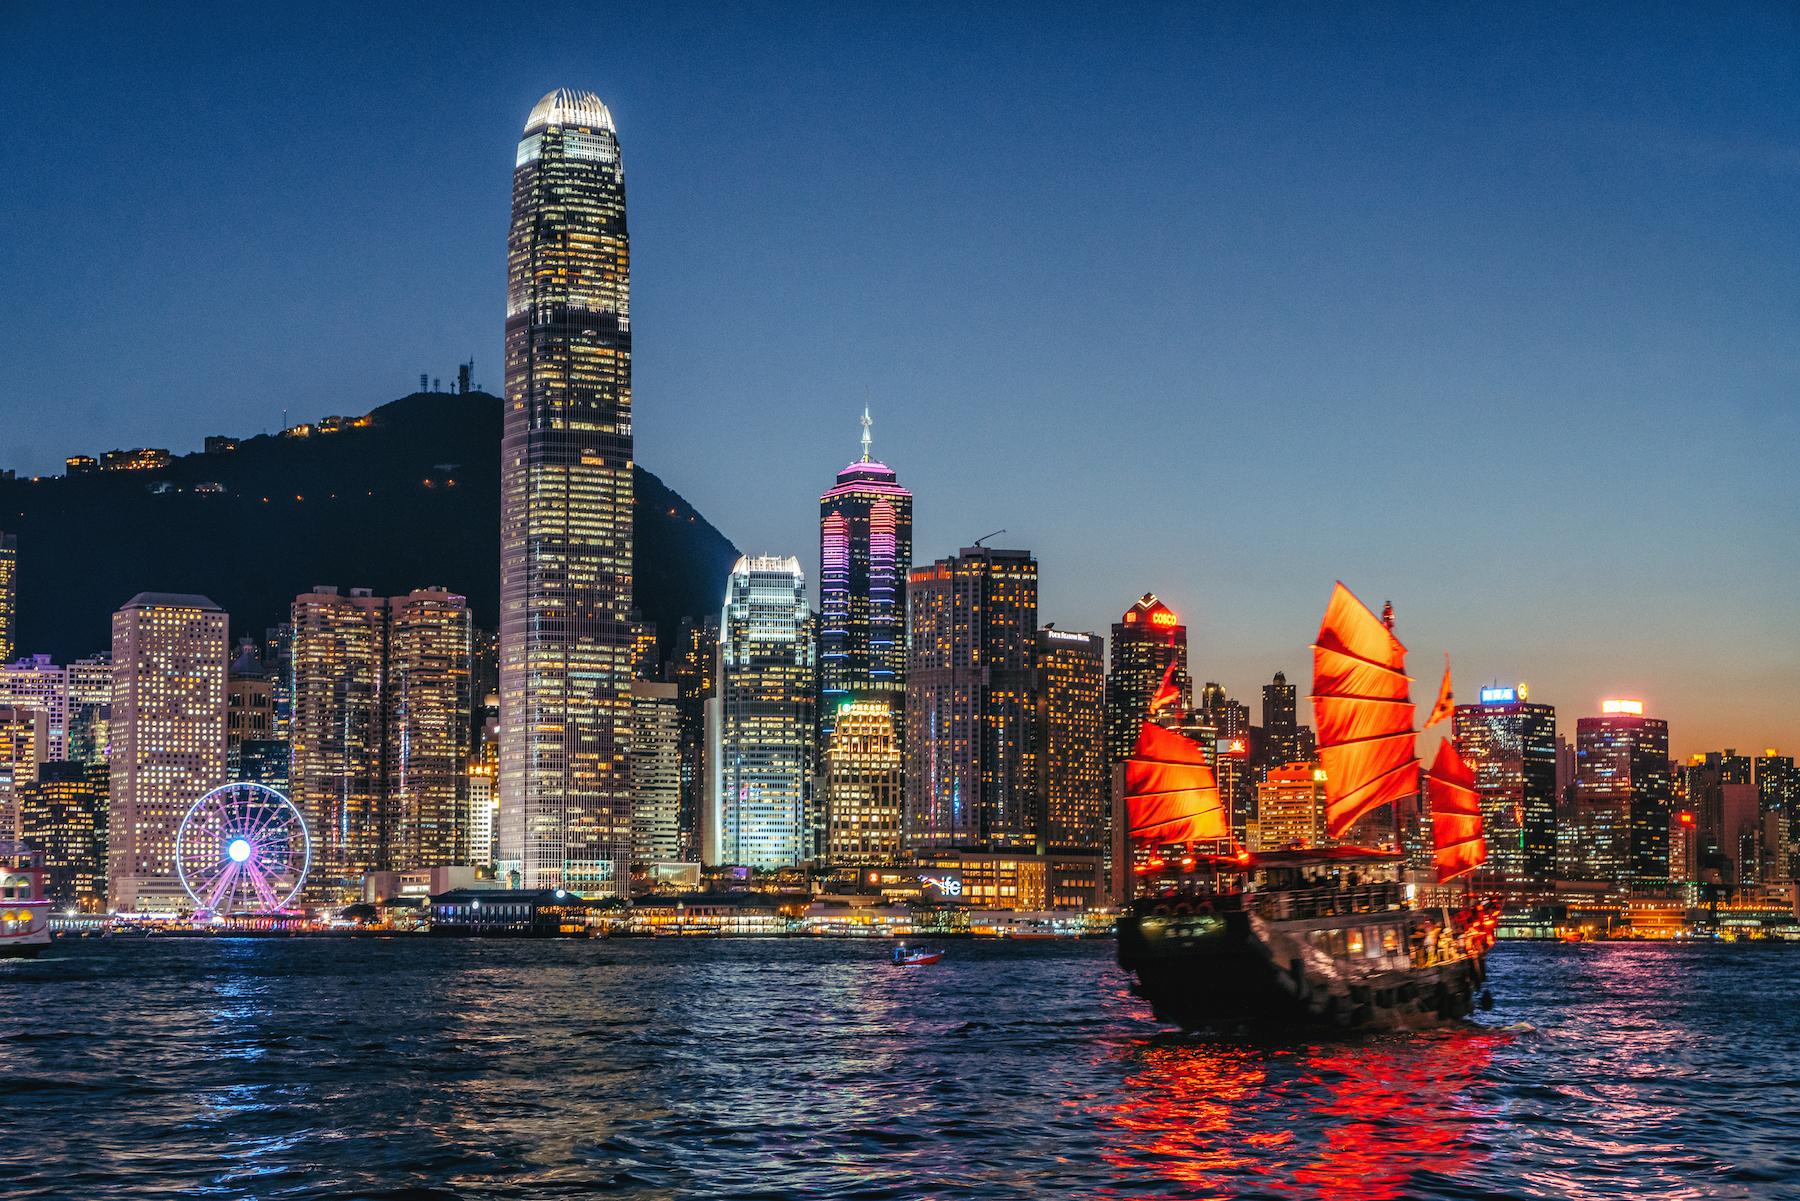 Cityscape Hong Kong and Junkboat at Twilight